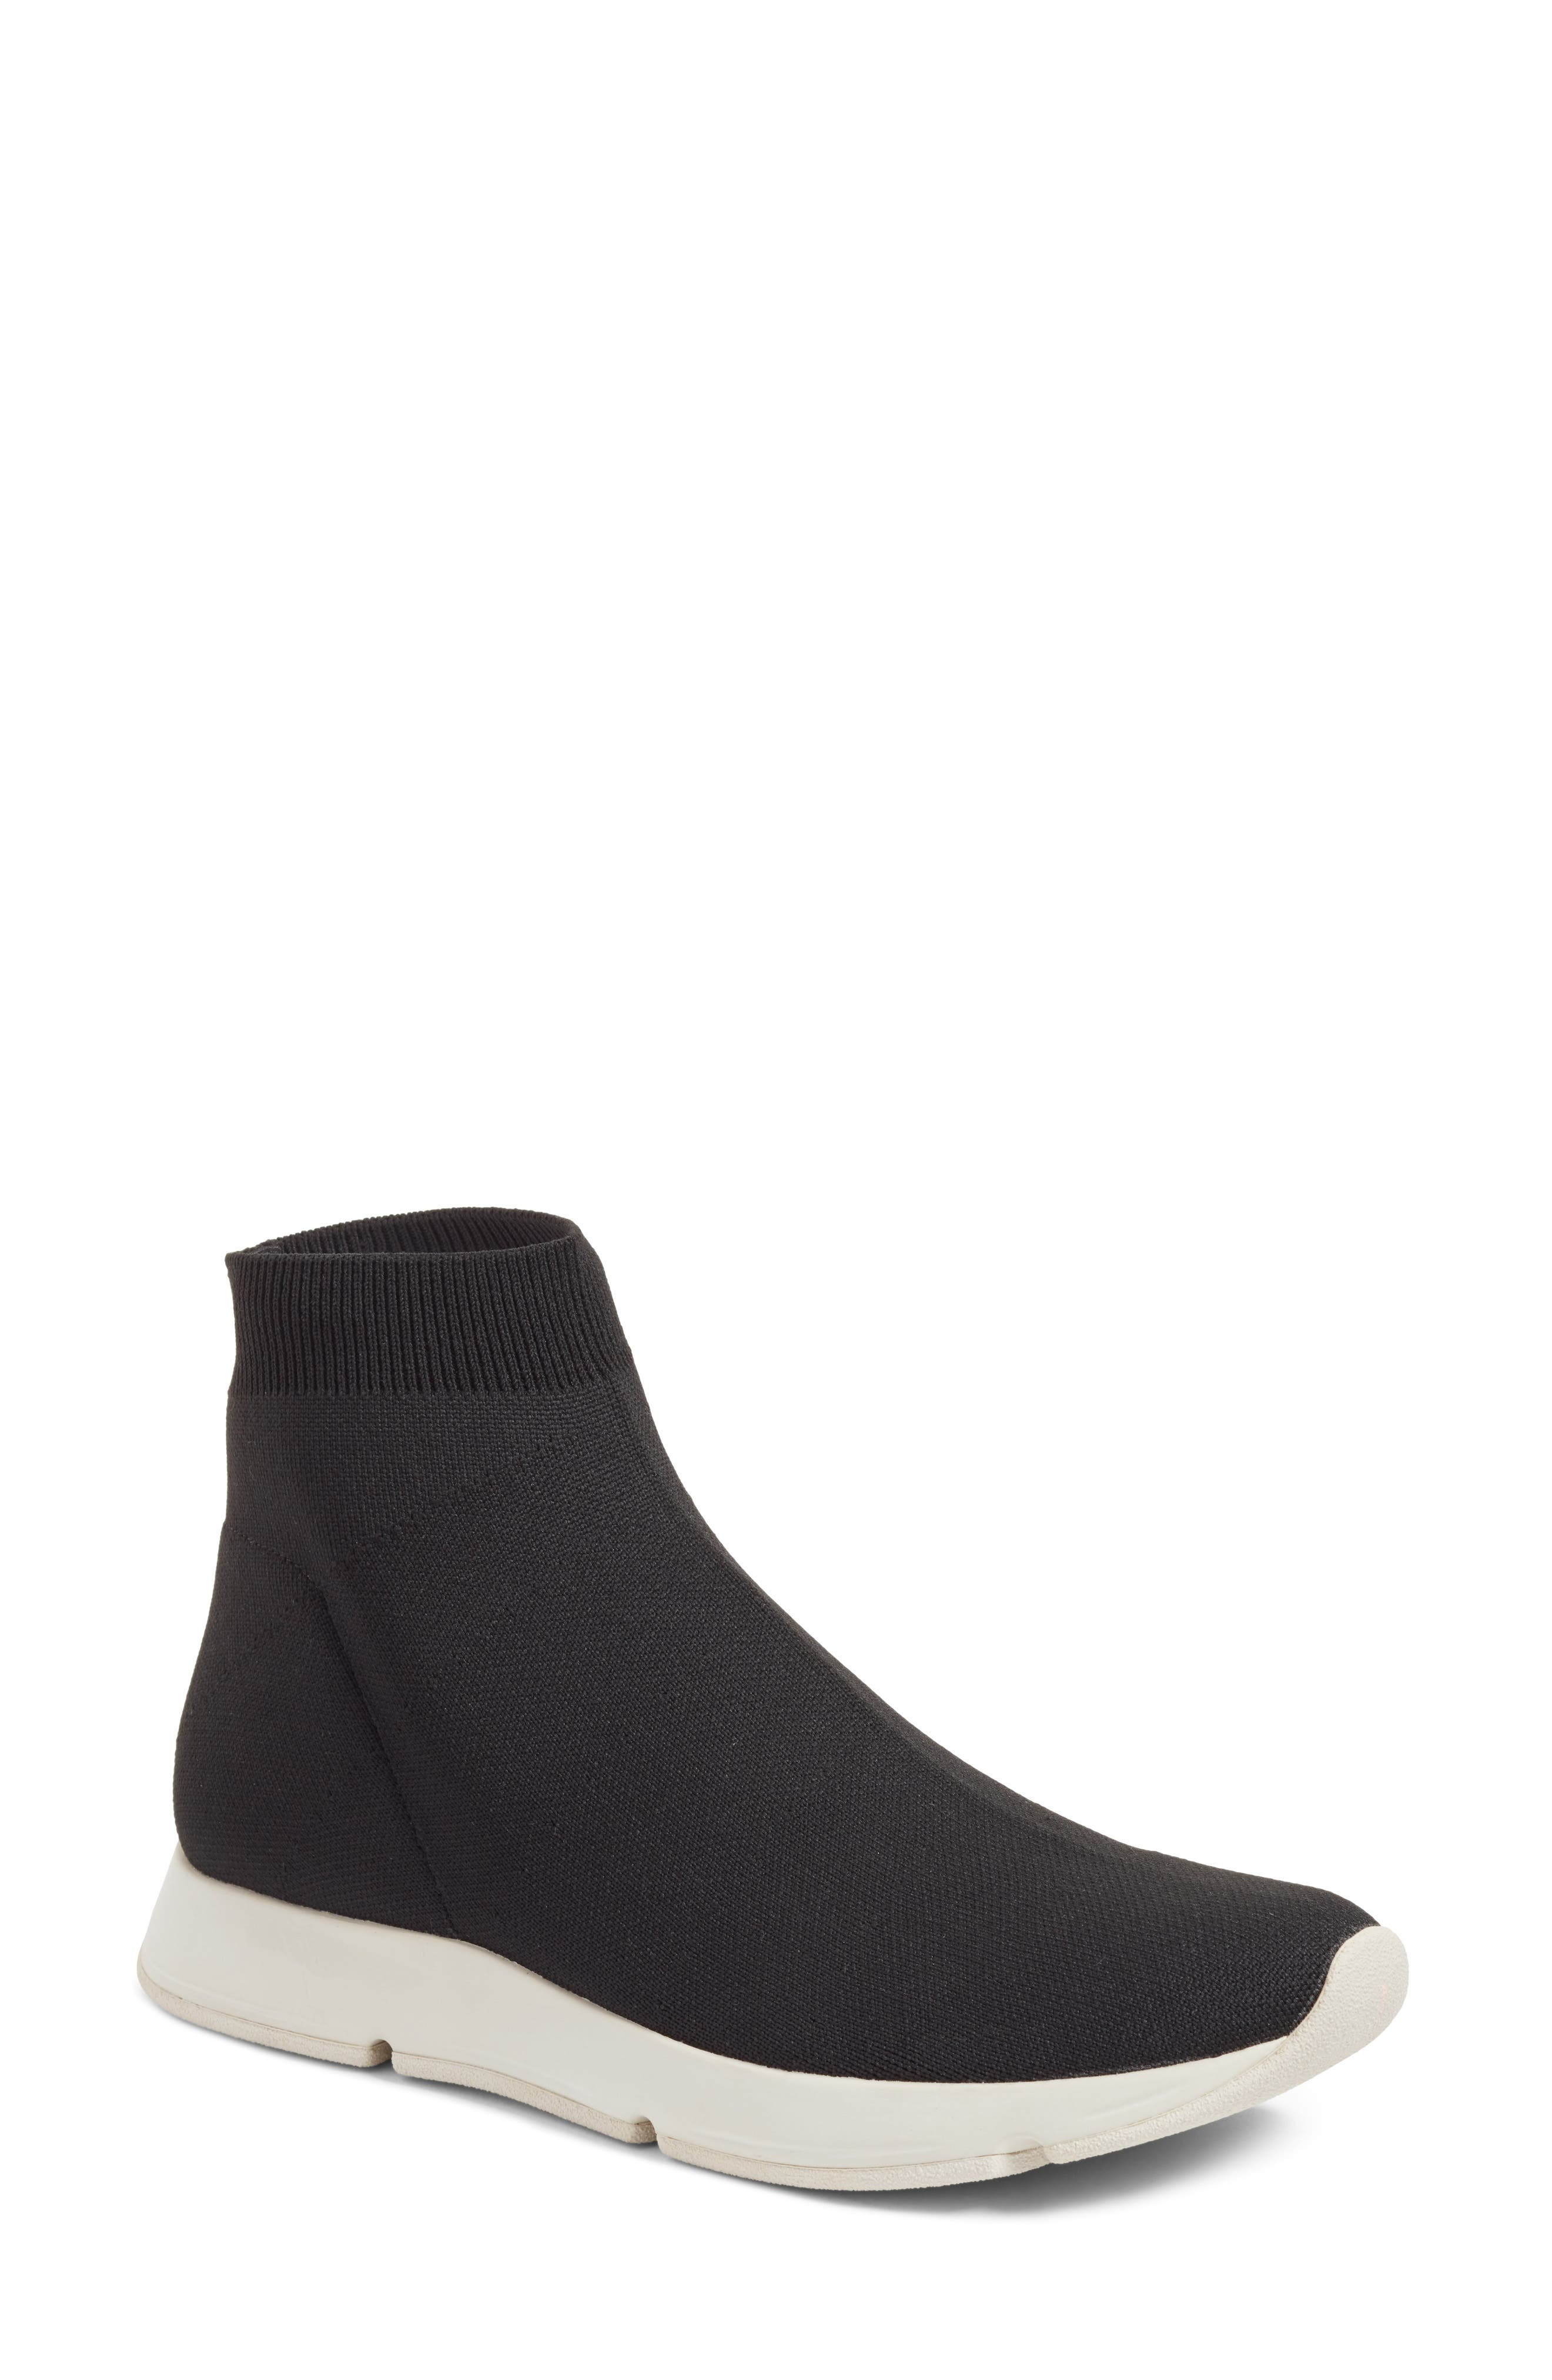 Tyra Sock Sneaker,                             Main thumbnail 1, color,